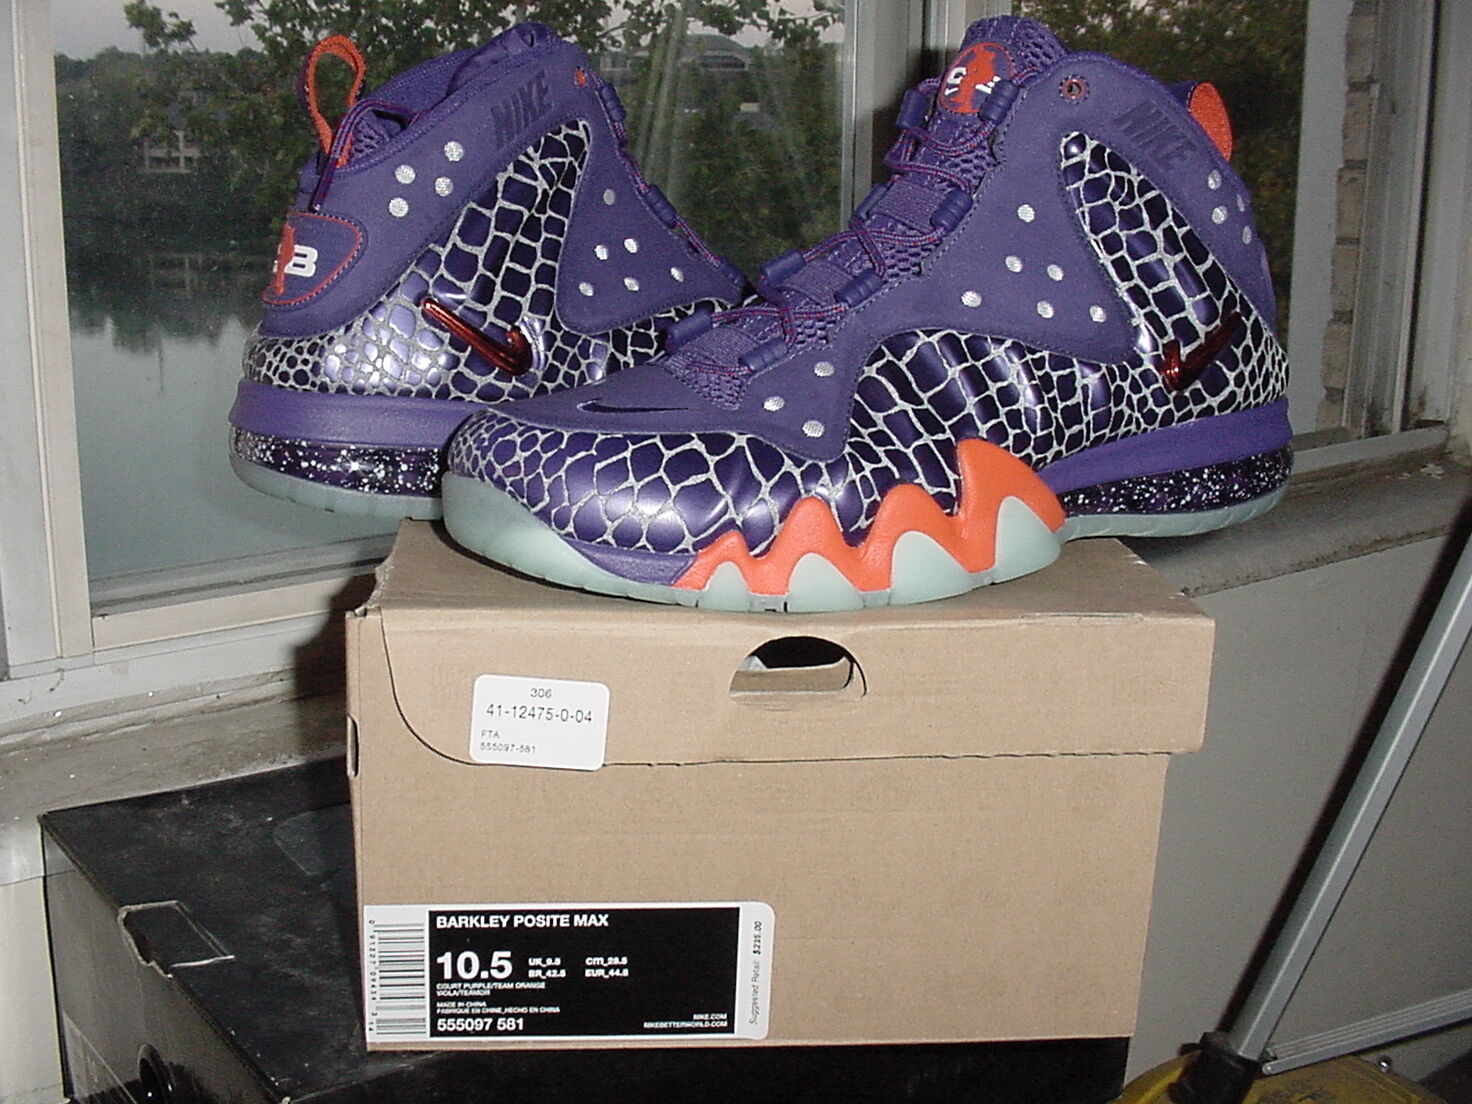 Nike Air Barkley Posite Max Chuckposite Phoenix Suns Purple Orange cb 555097 581 Brand discount